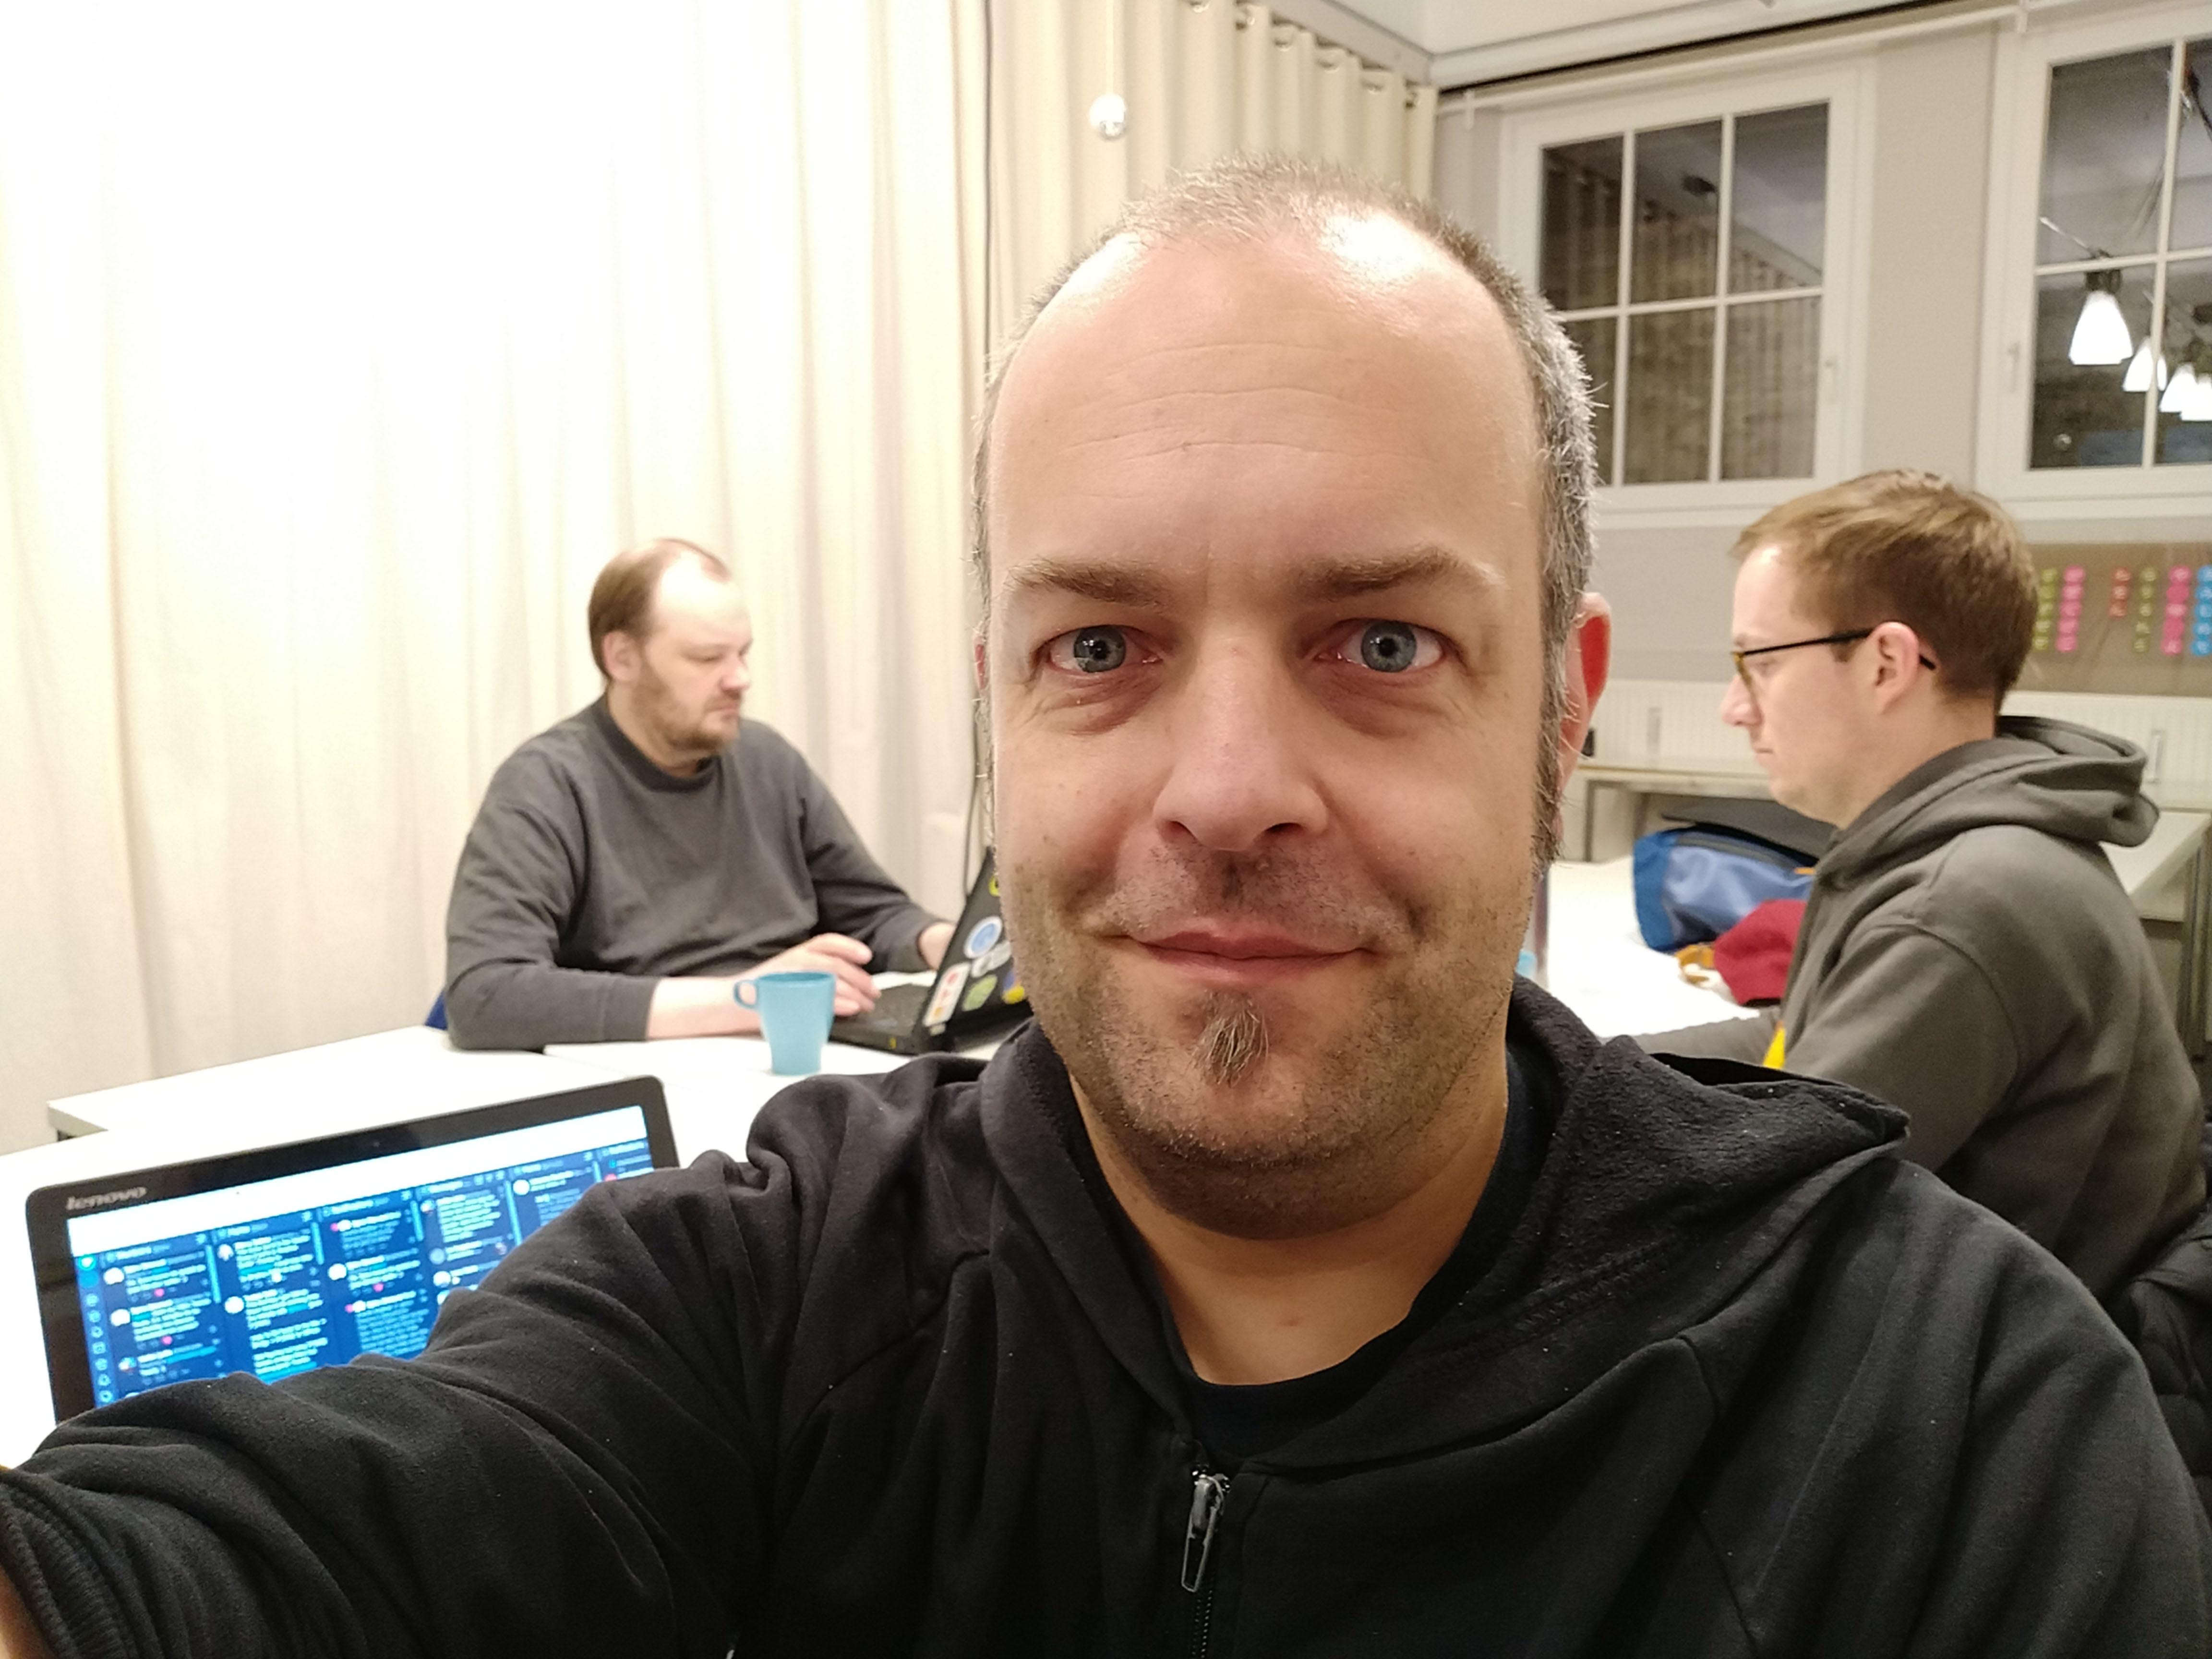 Sebastian, Björn & Joschi at the HWC Nuremberg